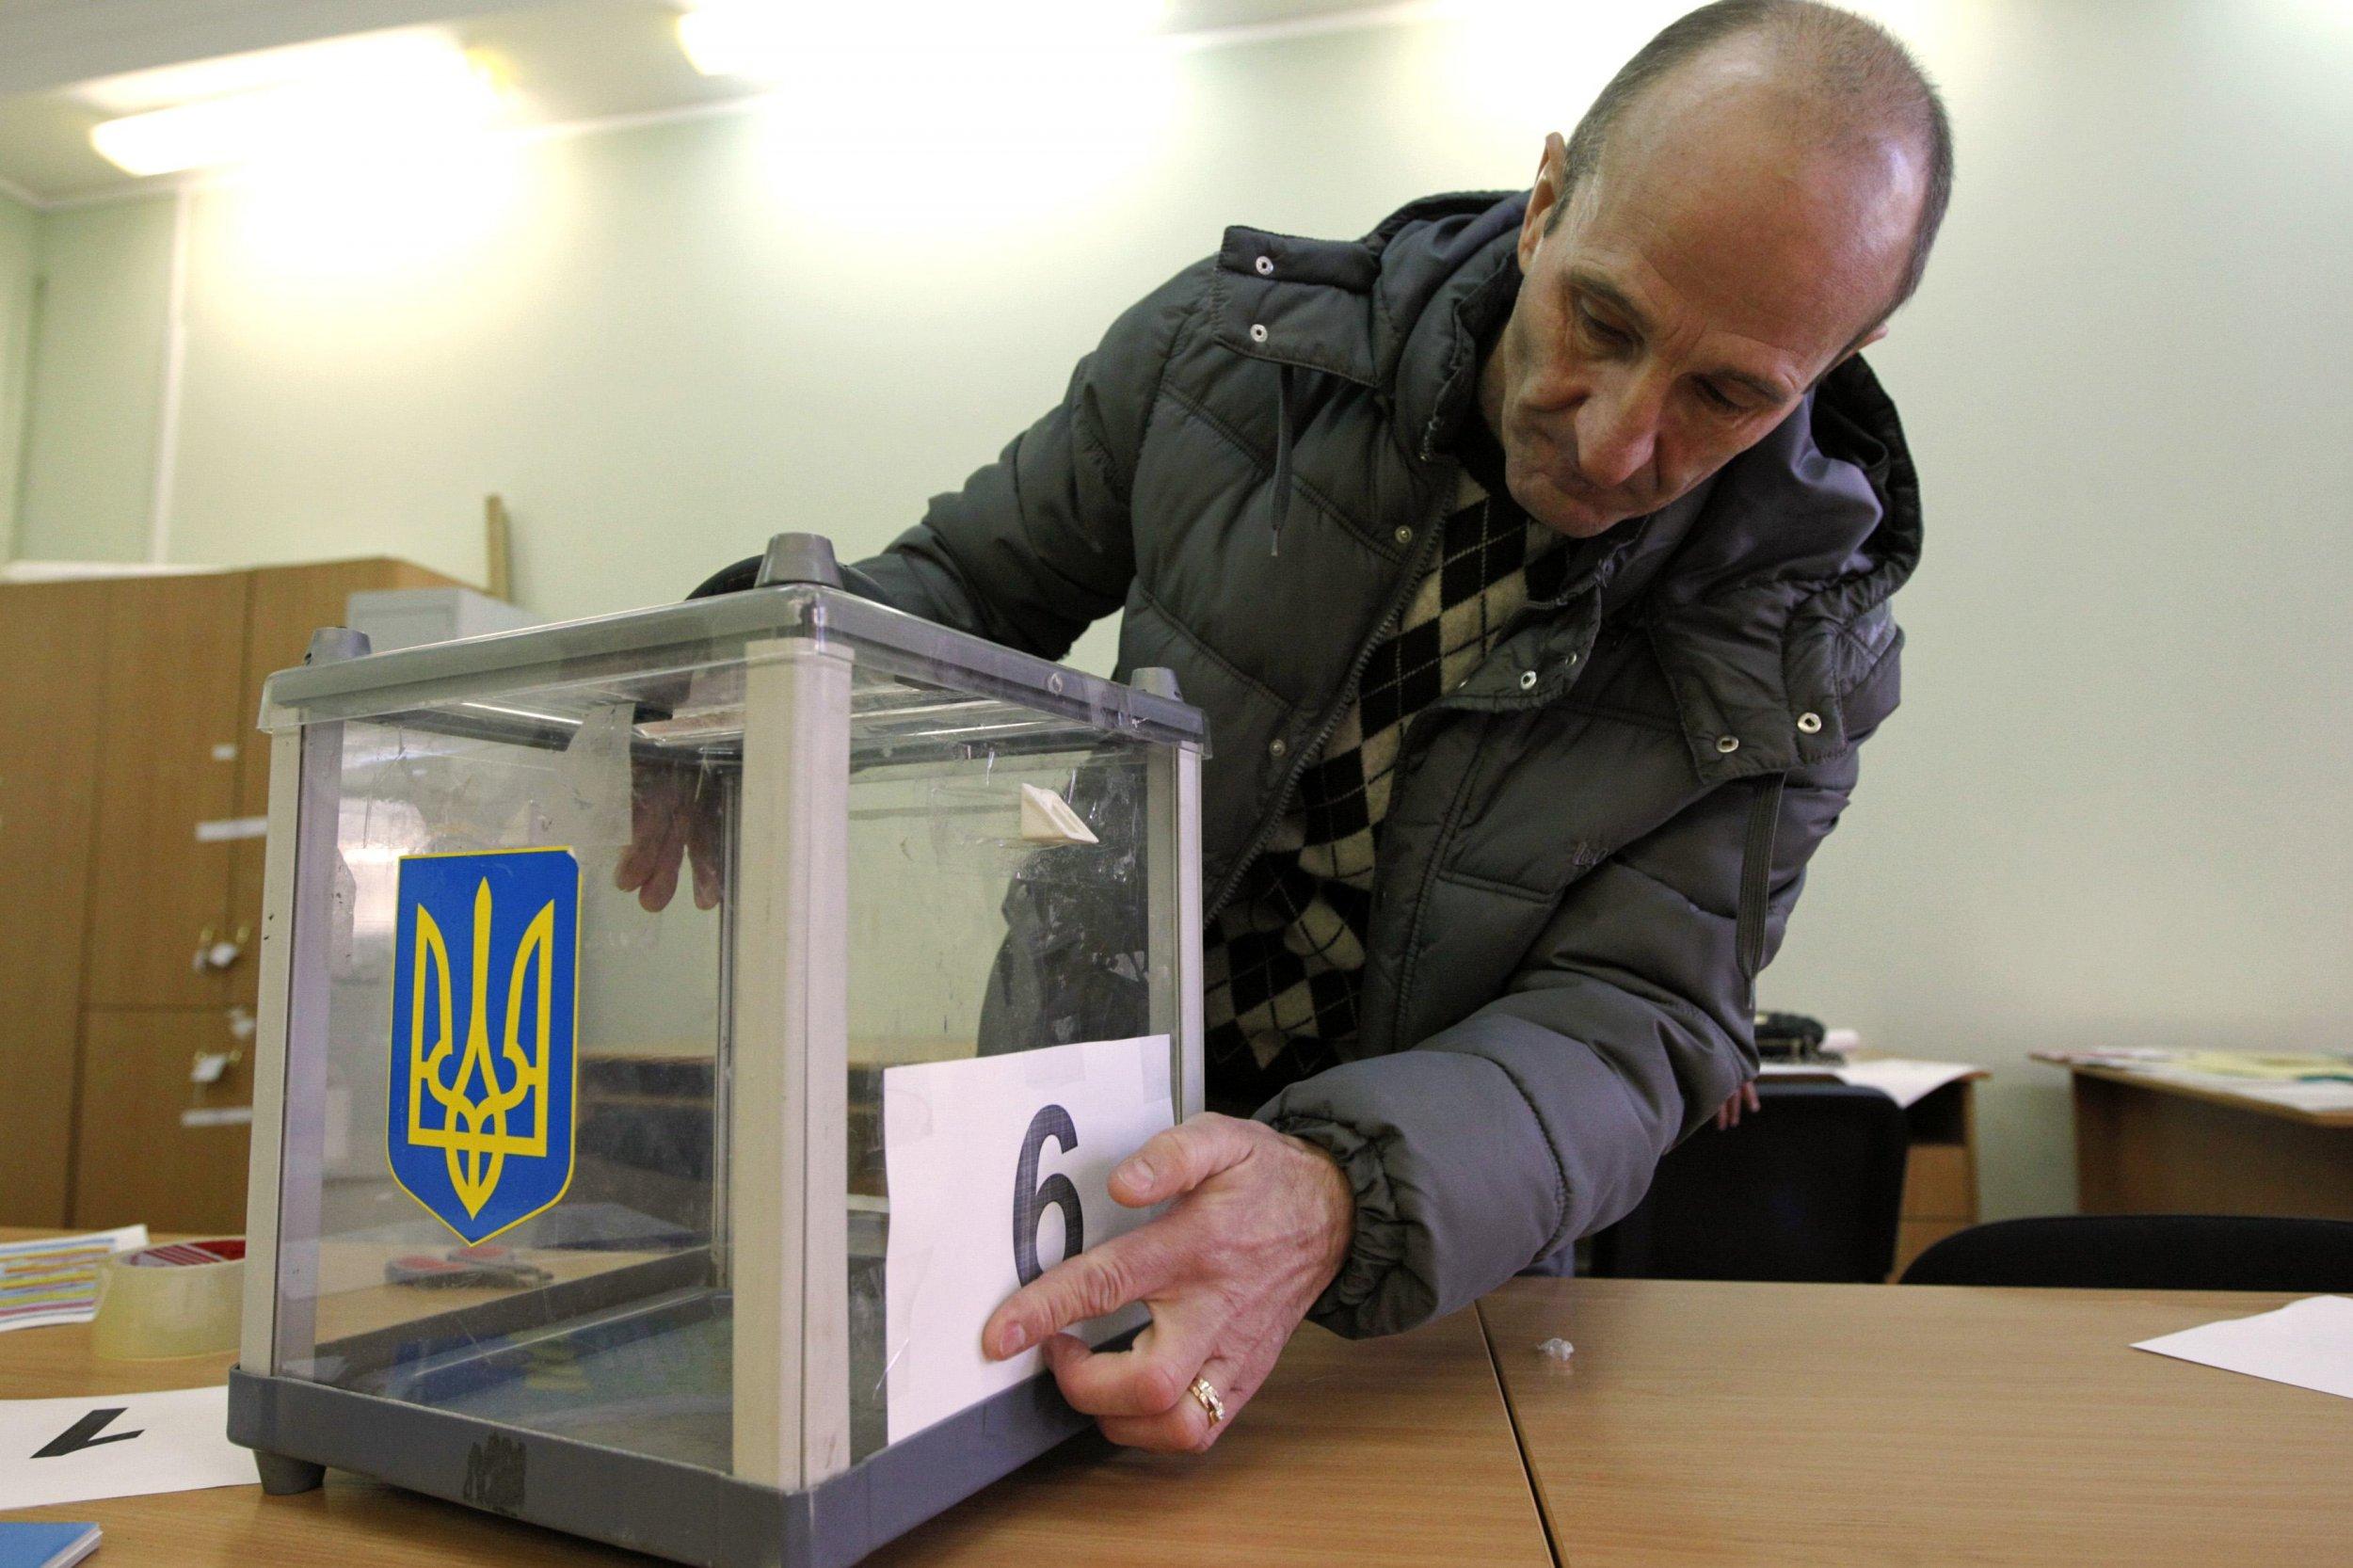 2014-10-25T181552Z_2_LYNXNPEA9O082_RTROPTP_4_UKRAINE-CRISIS-ELECTIONS